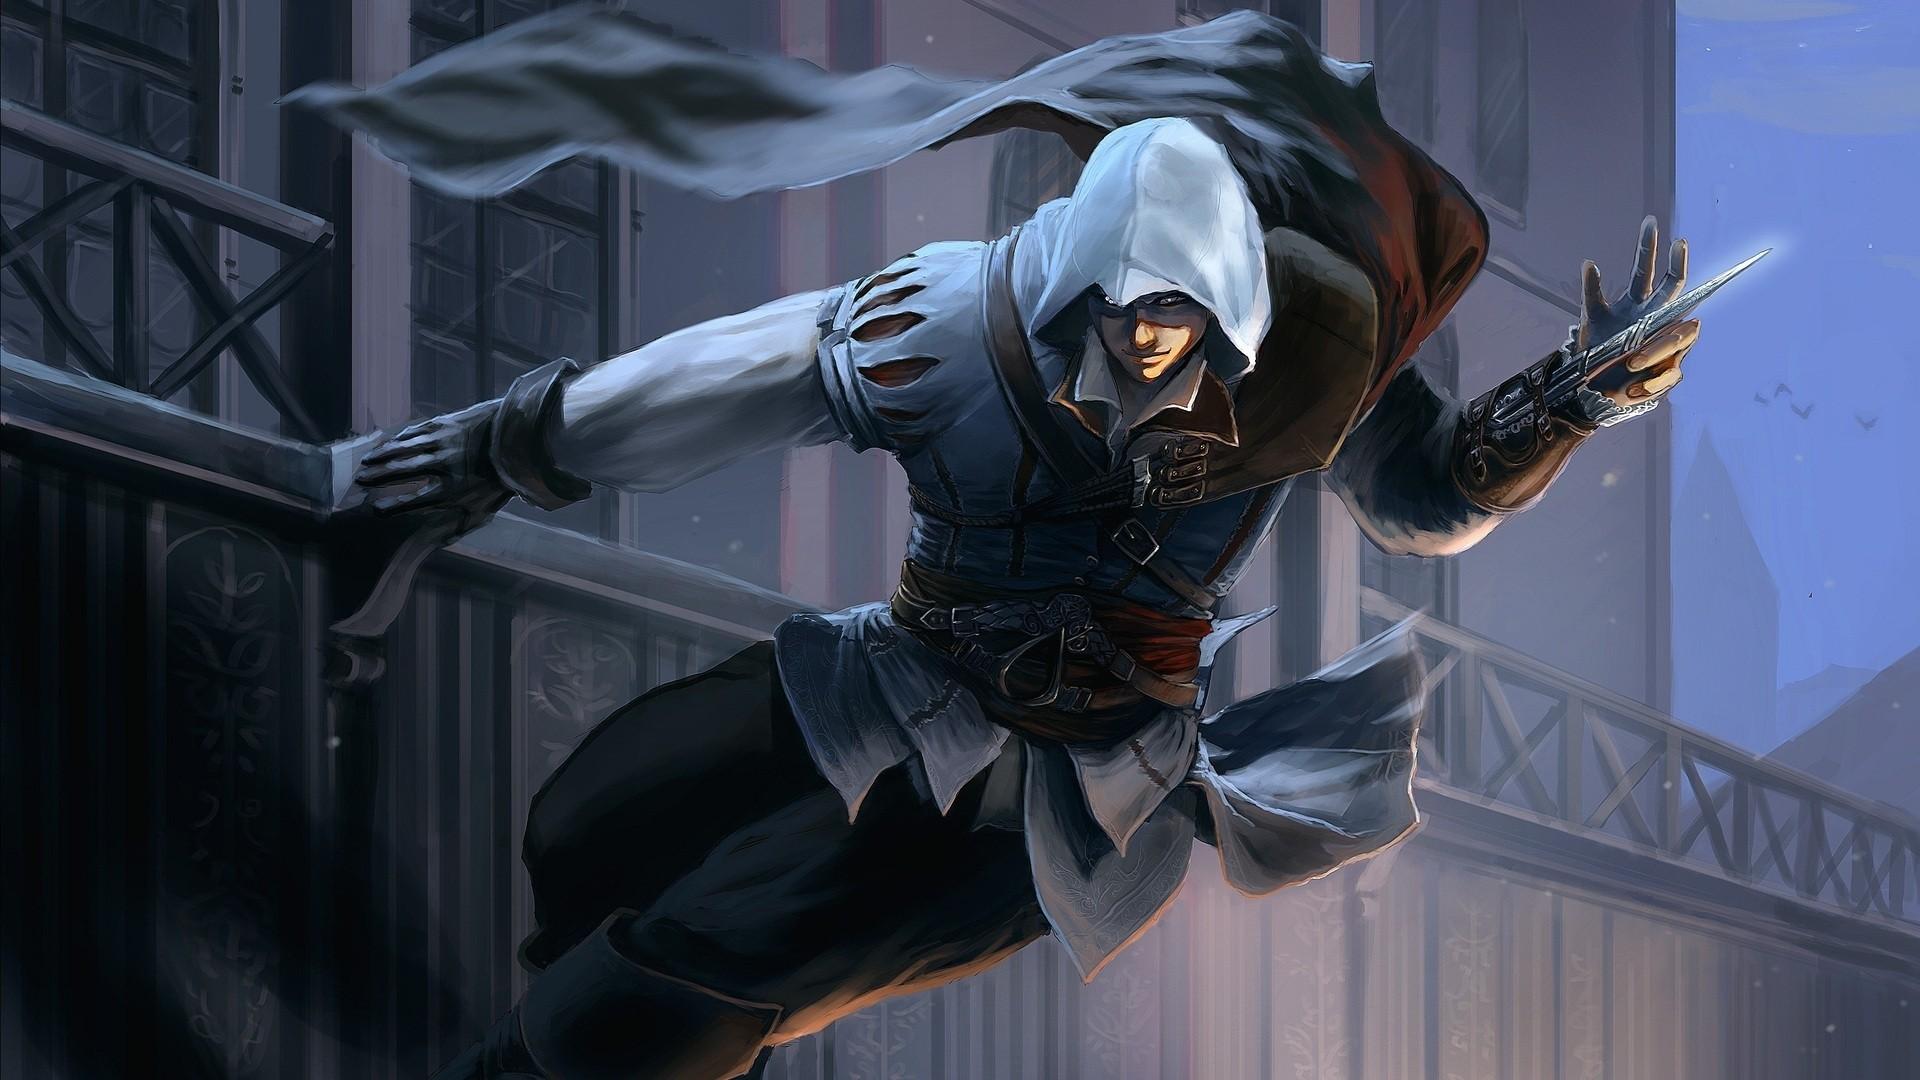 Assassin's Creed 2 Wallpaper Download Full